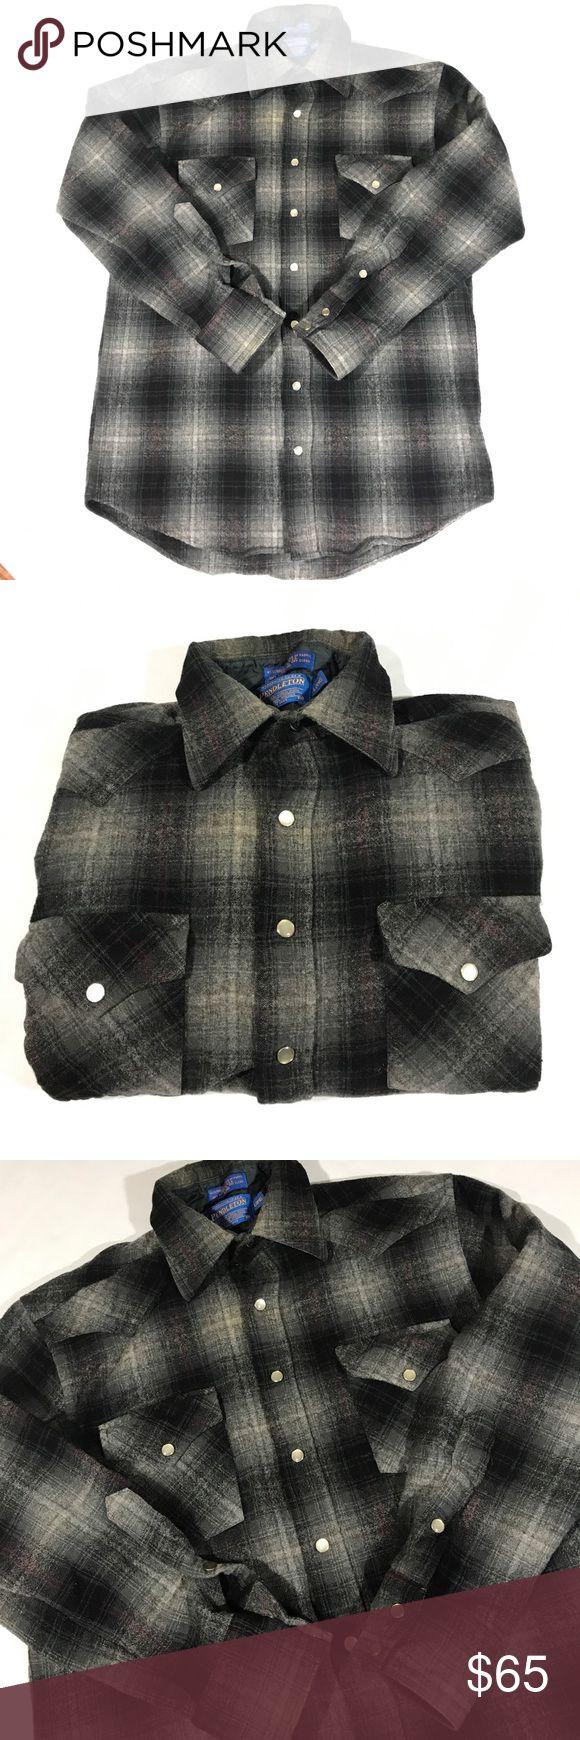 "Pendleton vintage plaid flannel Button down shirt Size M great condition no flaws. Armpit to armpit 19.5"" length 28"" sleeve length 21.5"" Pendleton Shirts Casual Button Down Shirts"